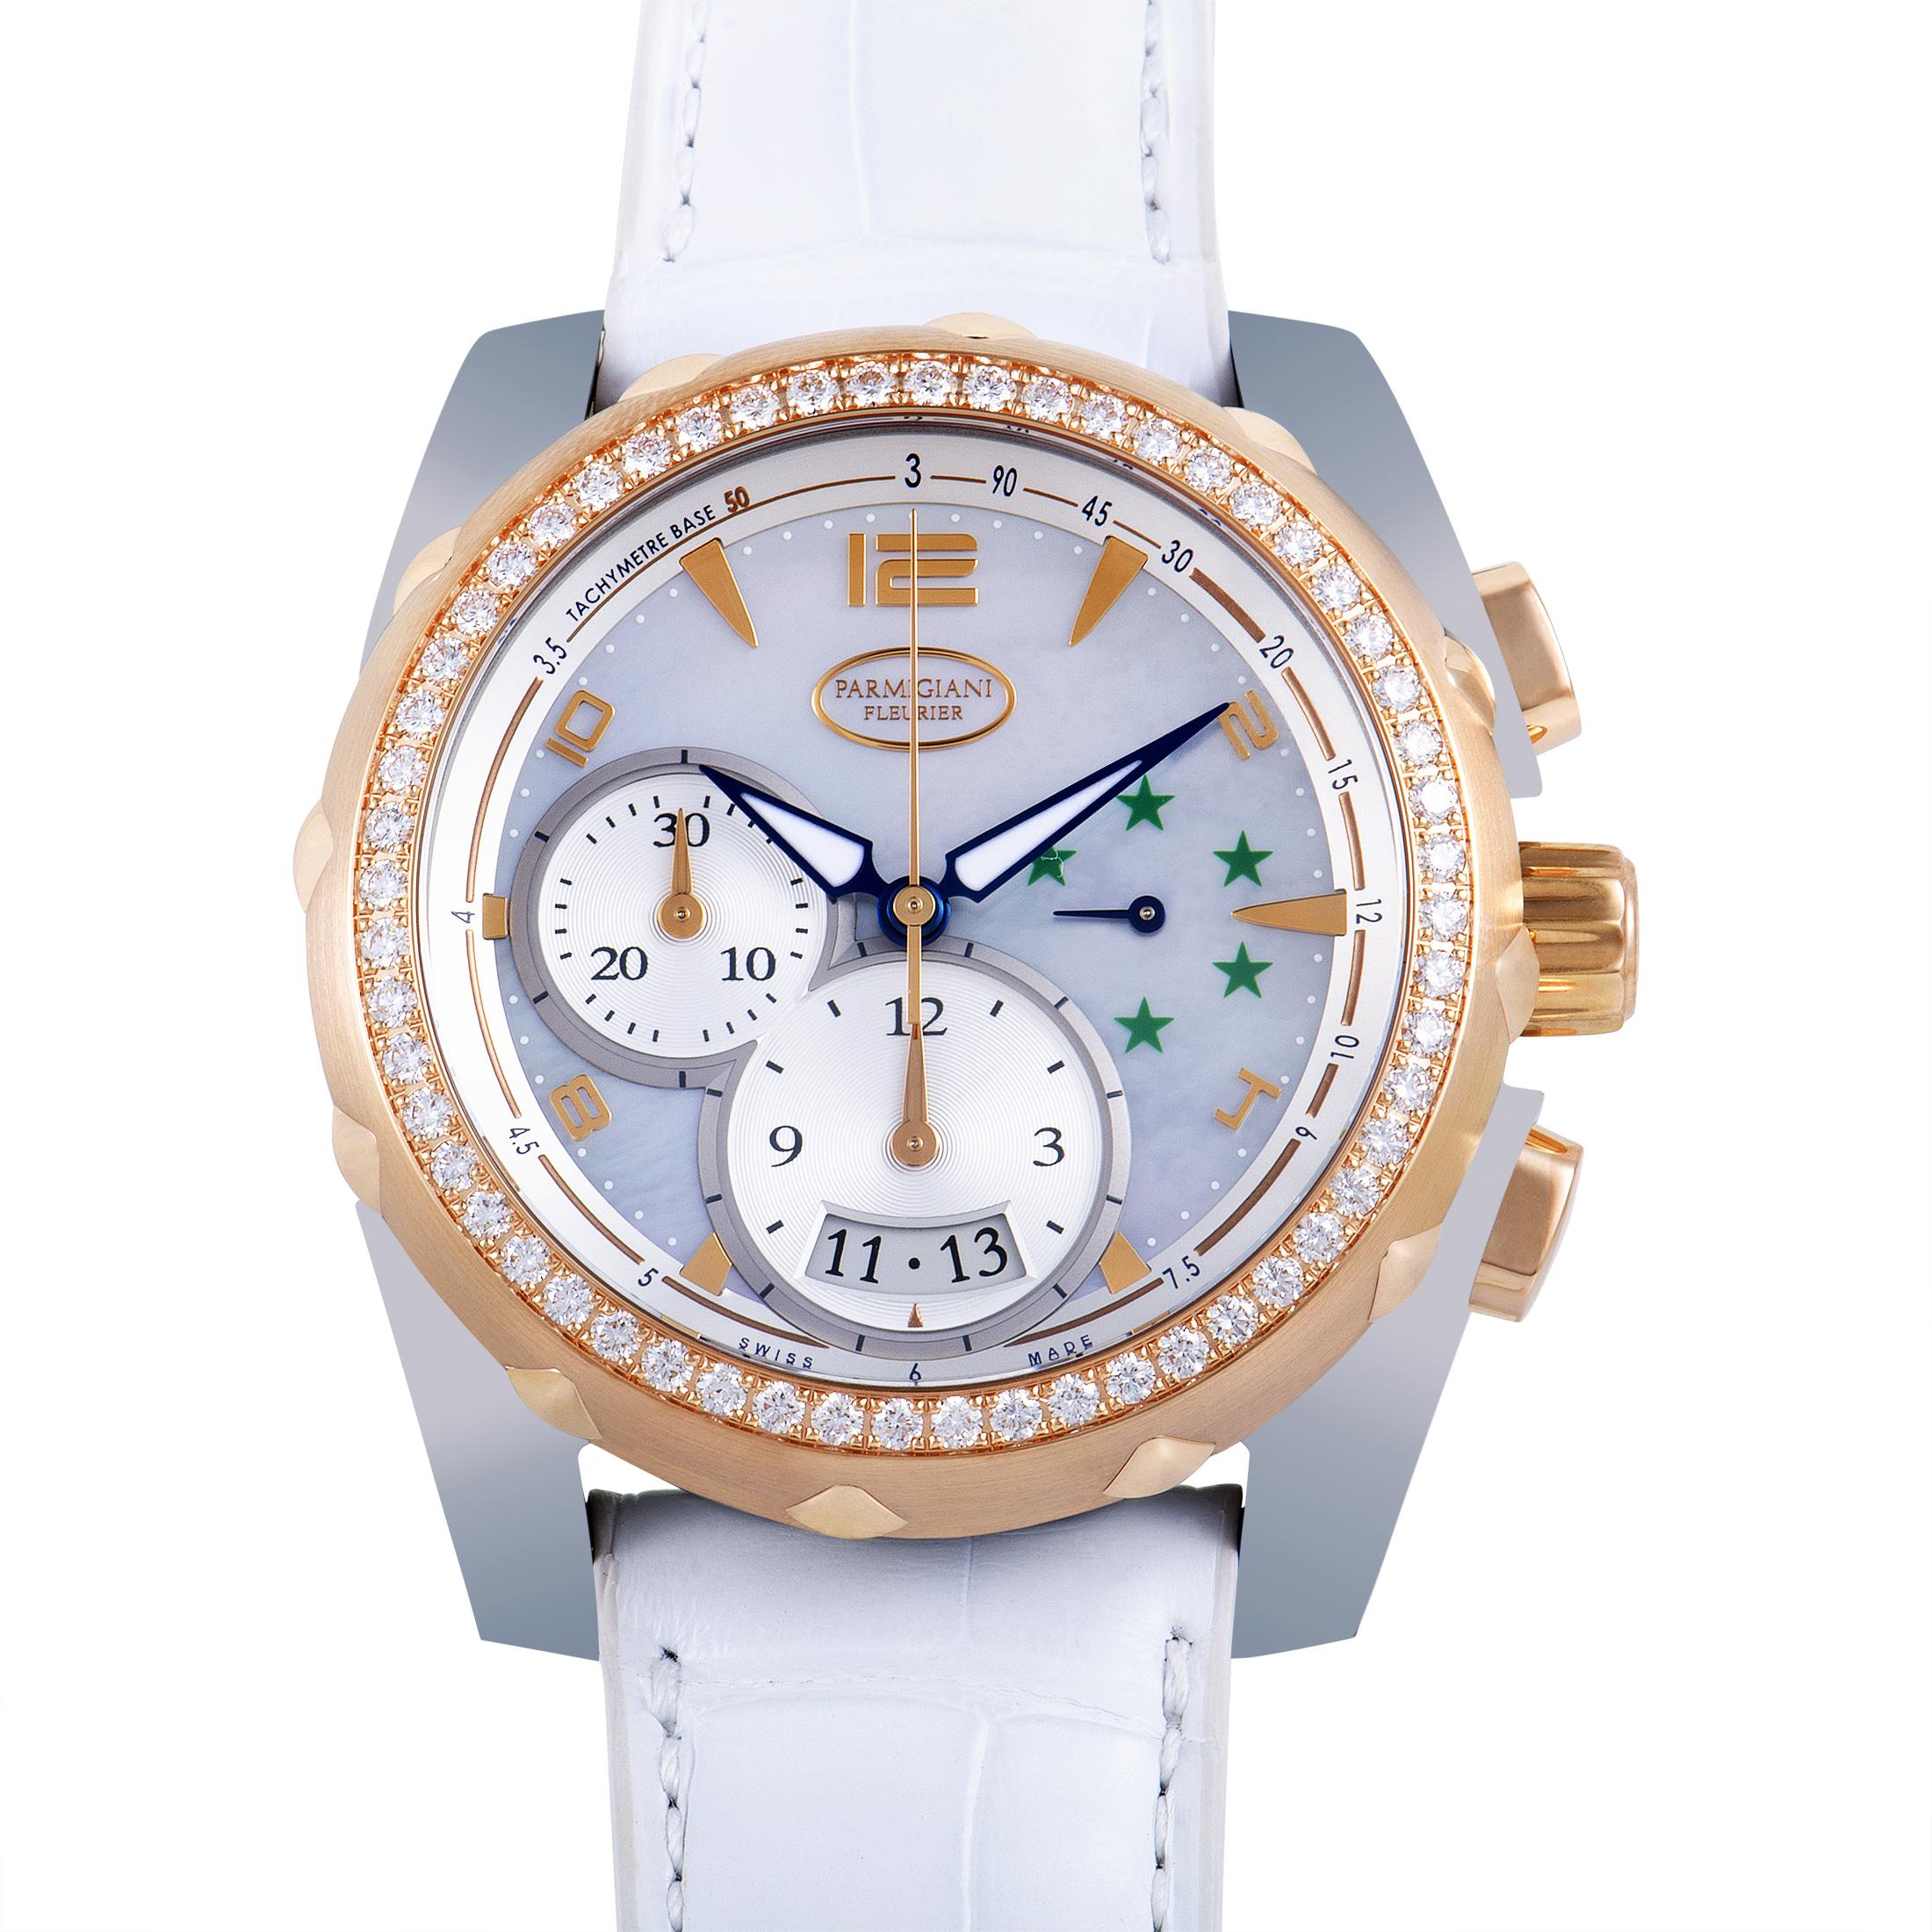 Pershing CBF Automatic Chronograph Watch PFC528-0233300